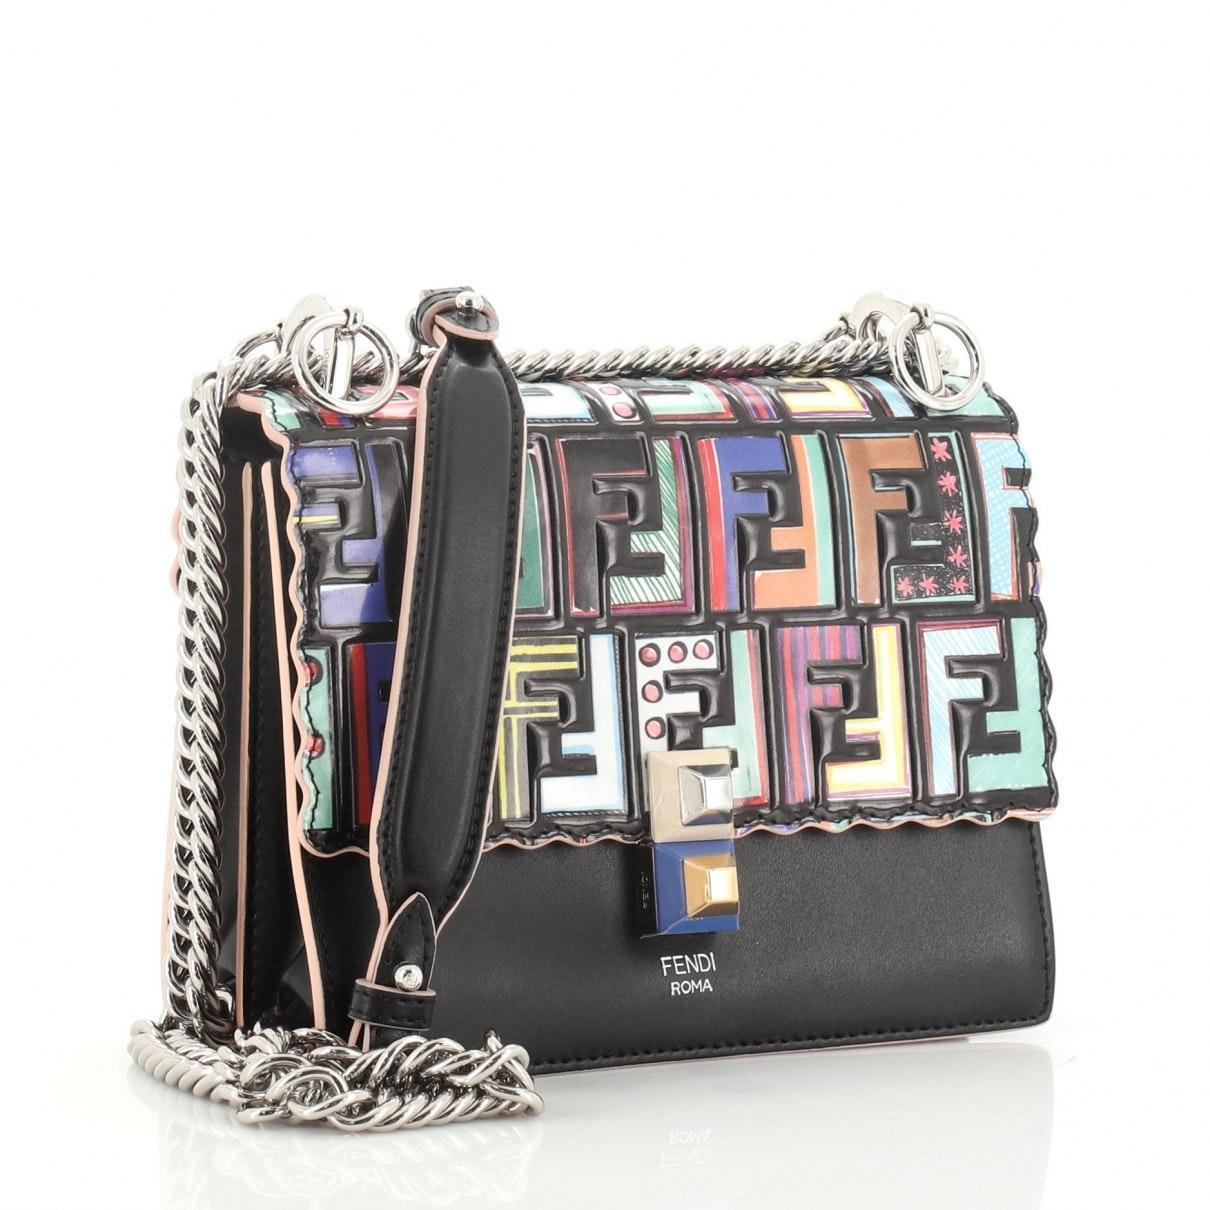 Fendi Leder Lackleder Handtaschen in Schwarz IVufO